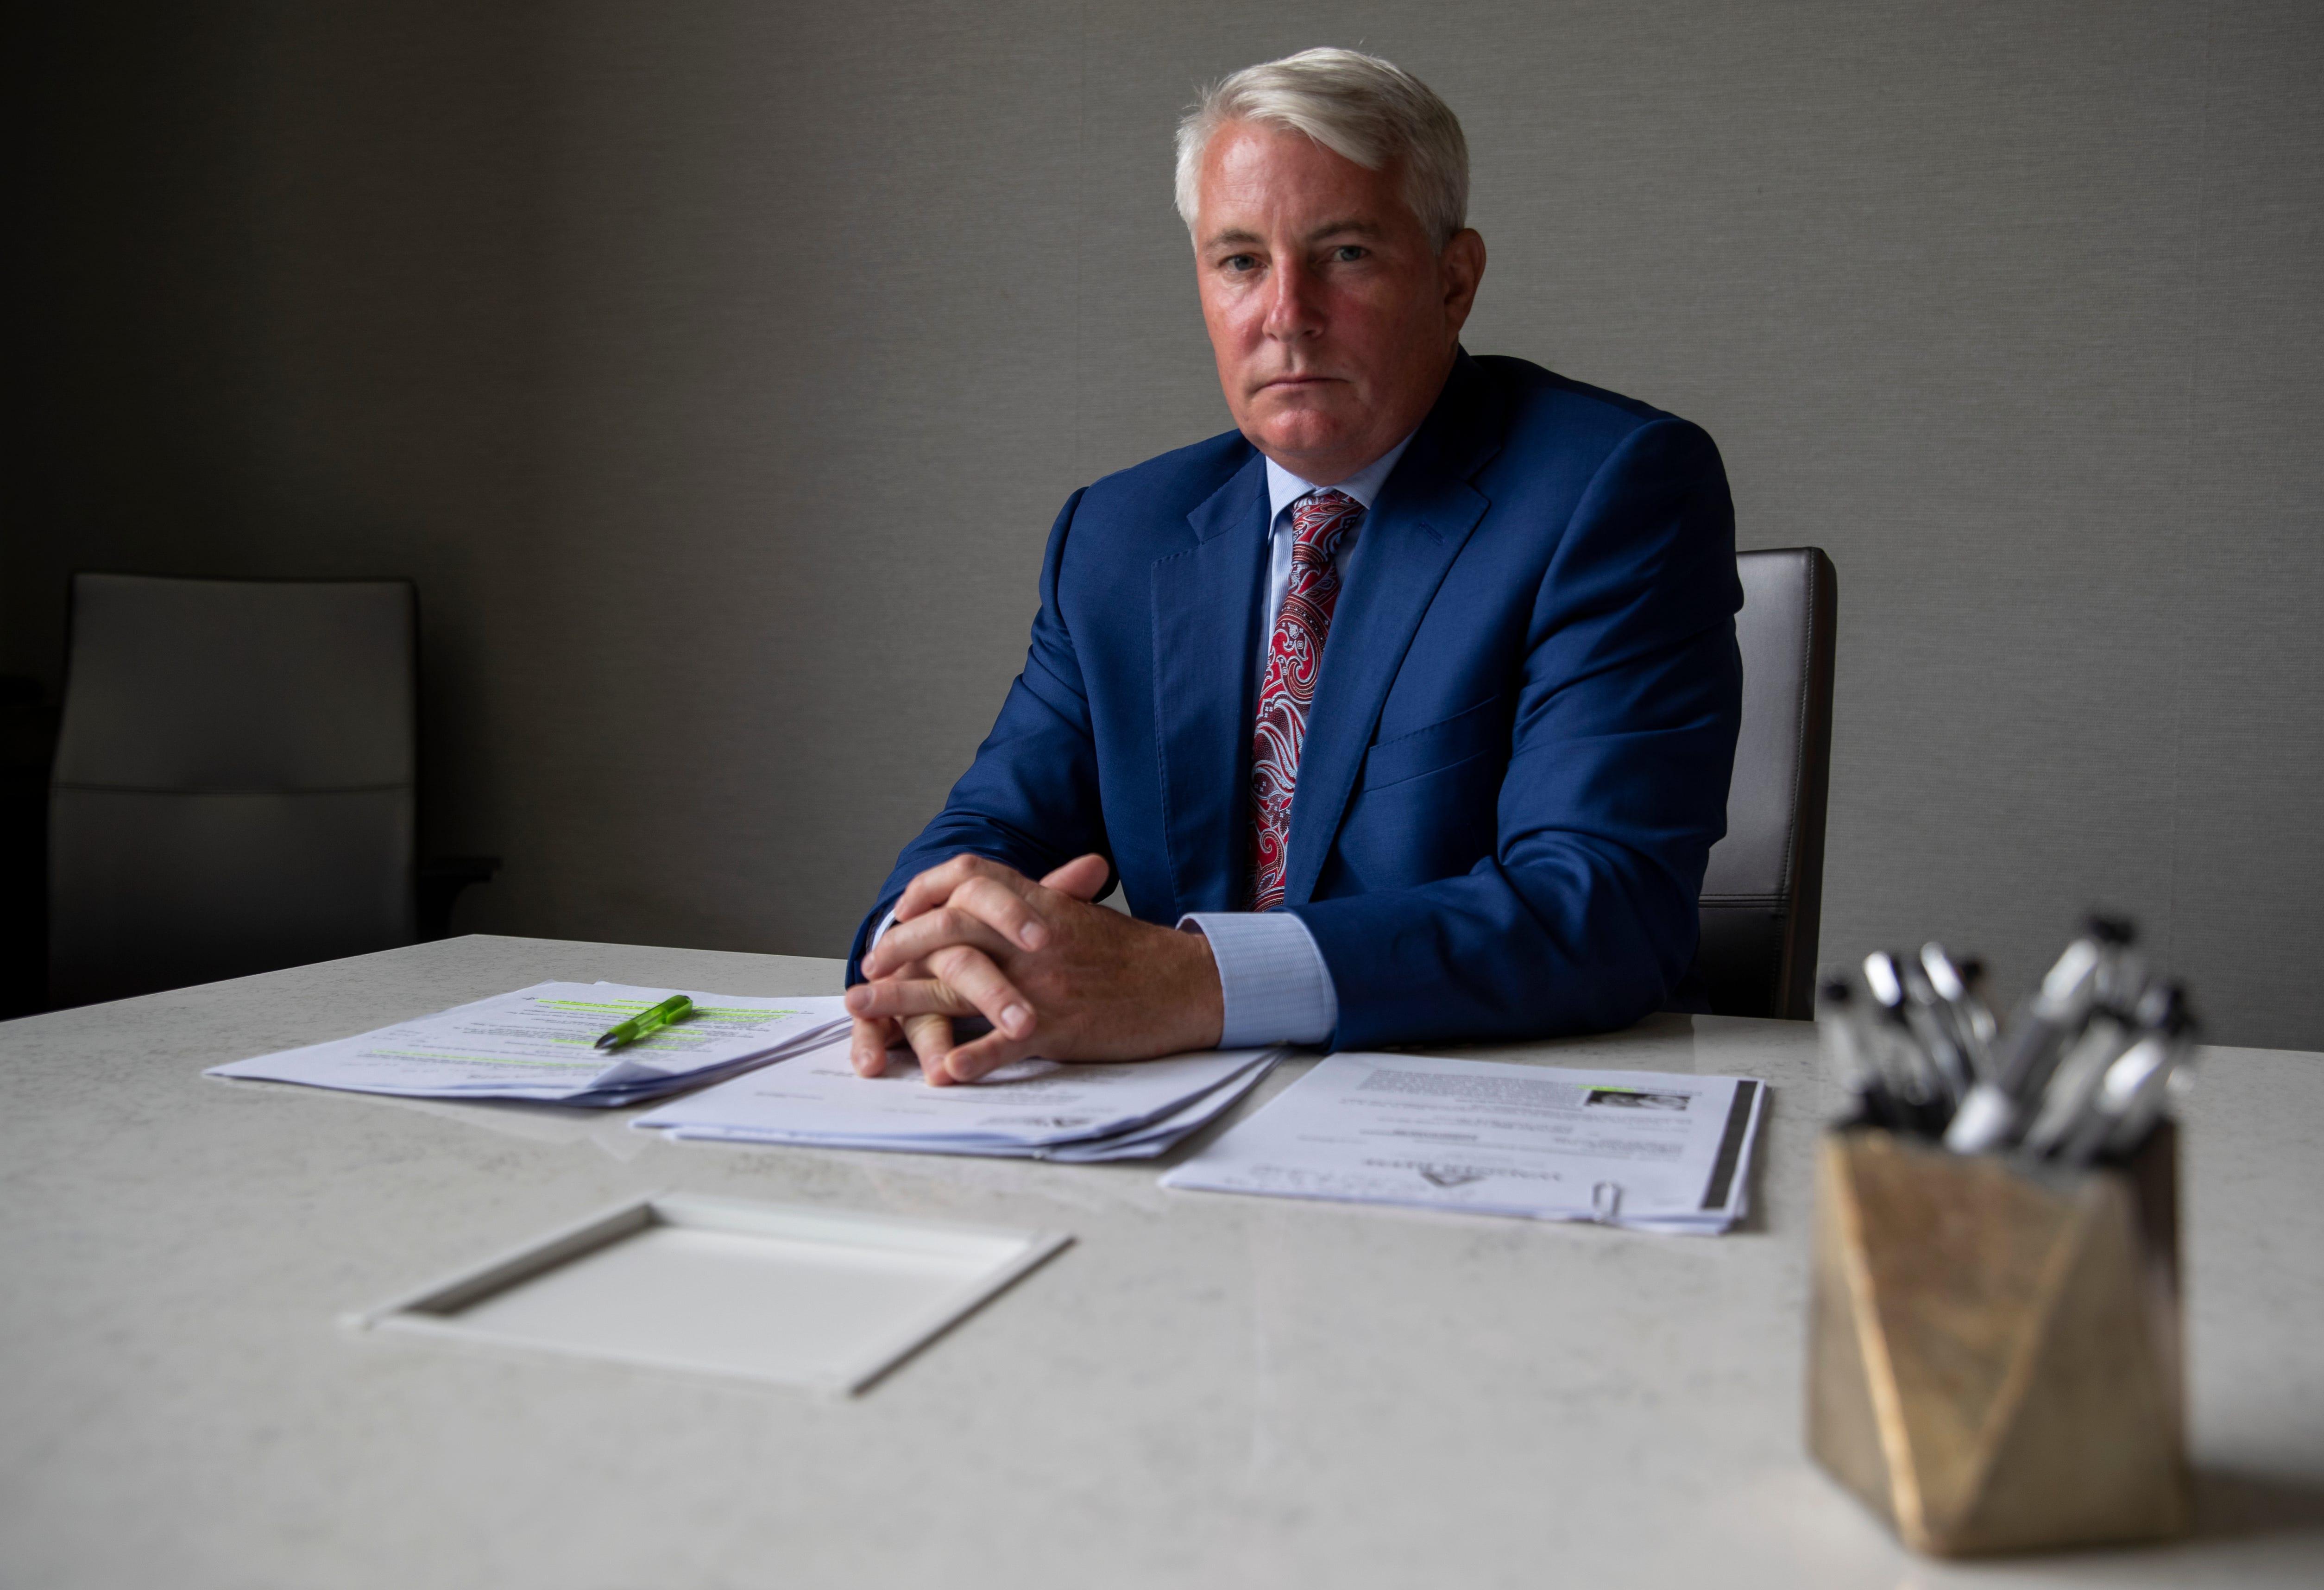 Stephen Wagner, Carmel attorney